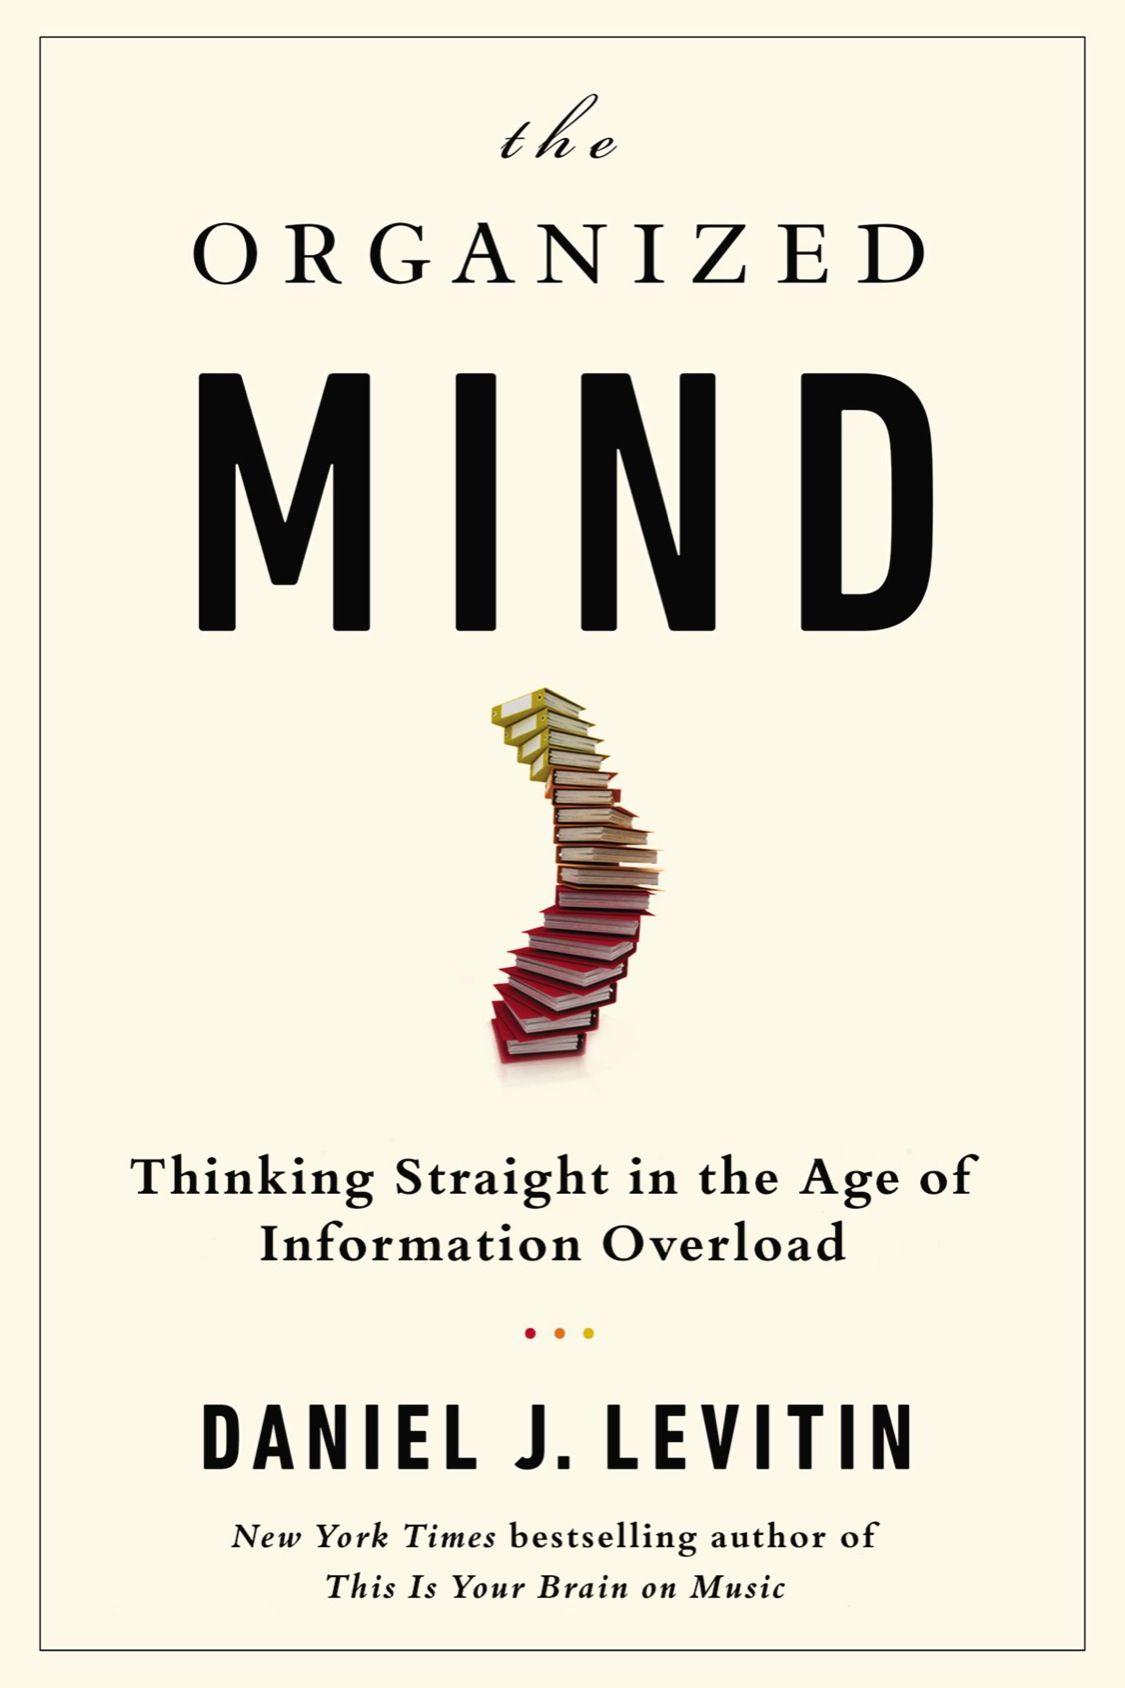 organized mind.jpg